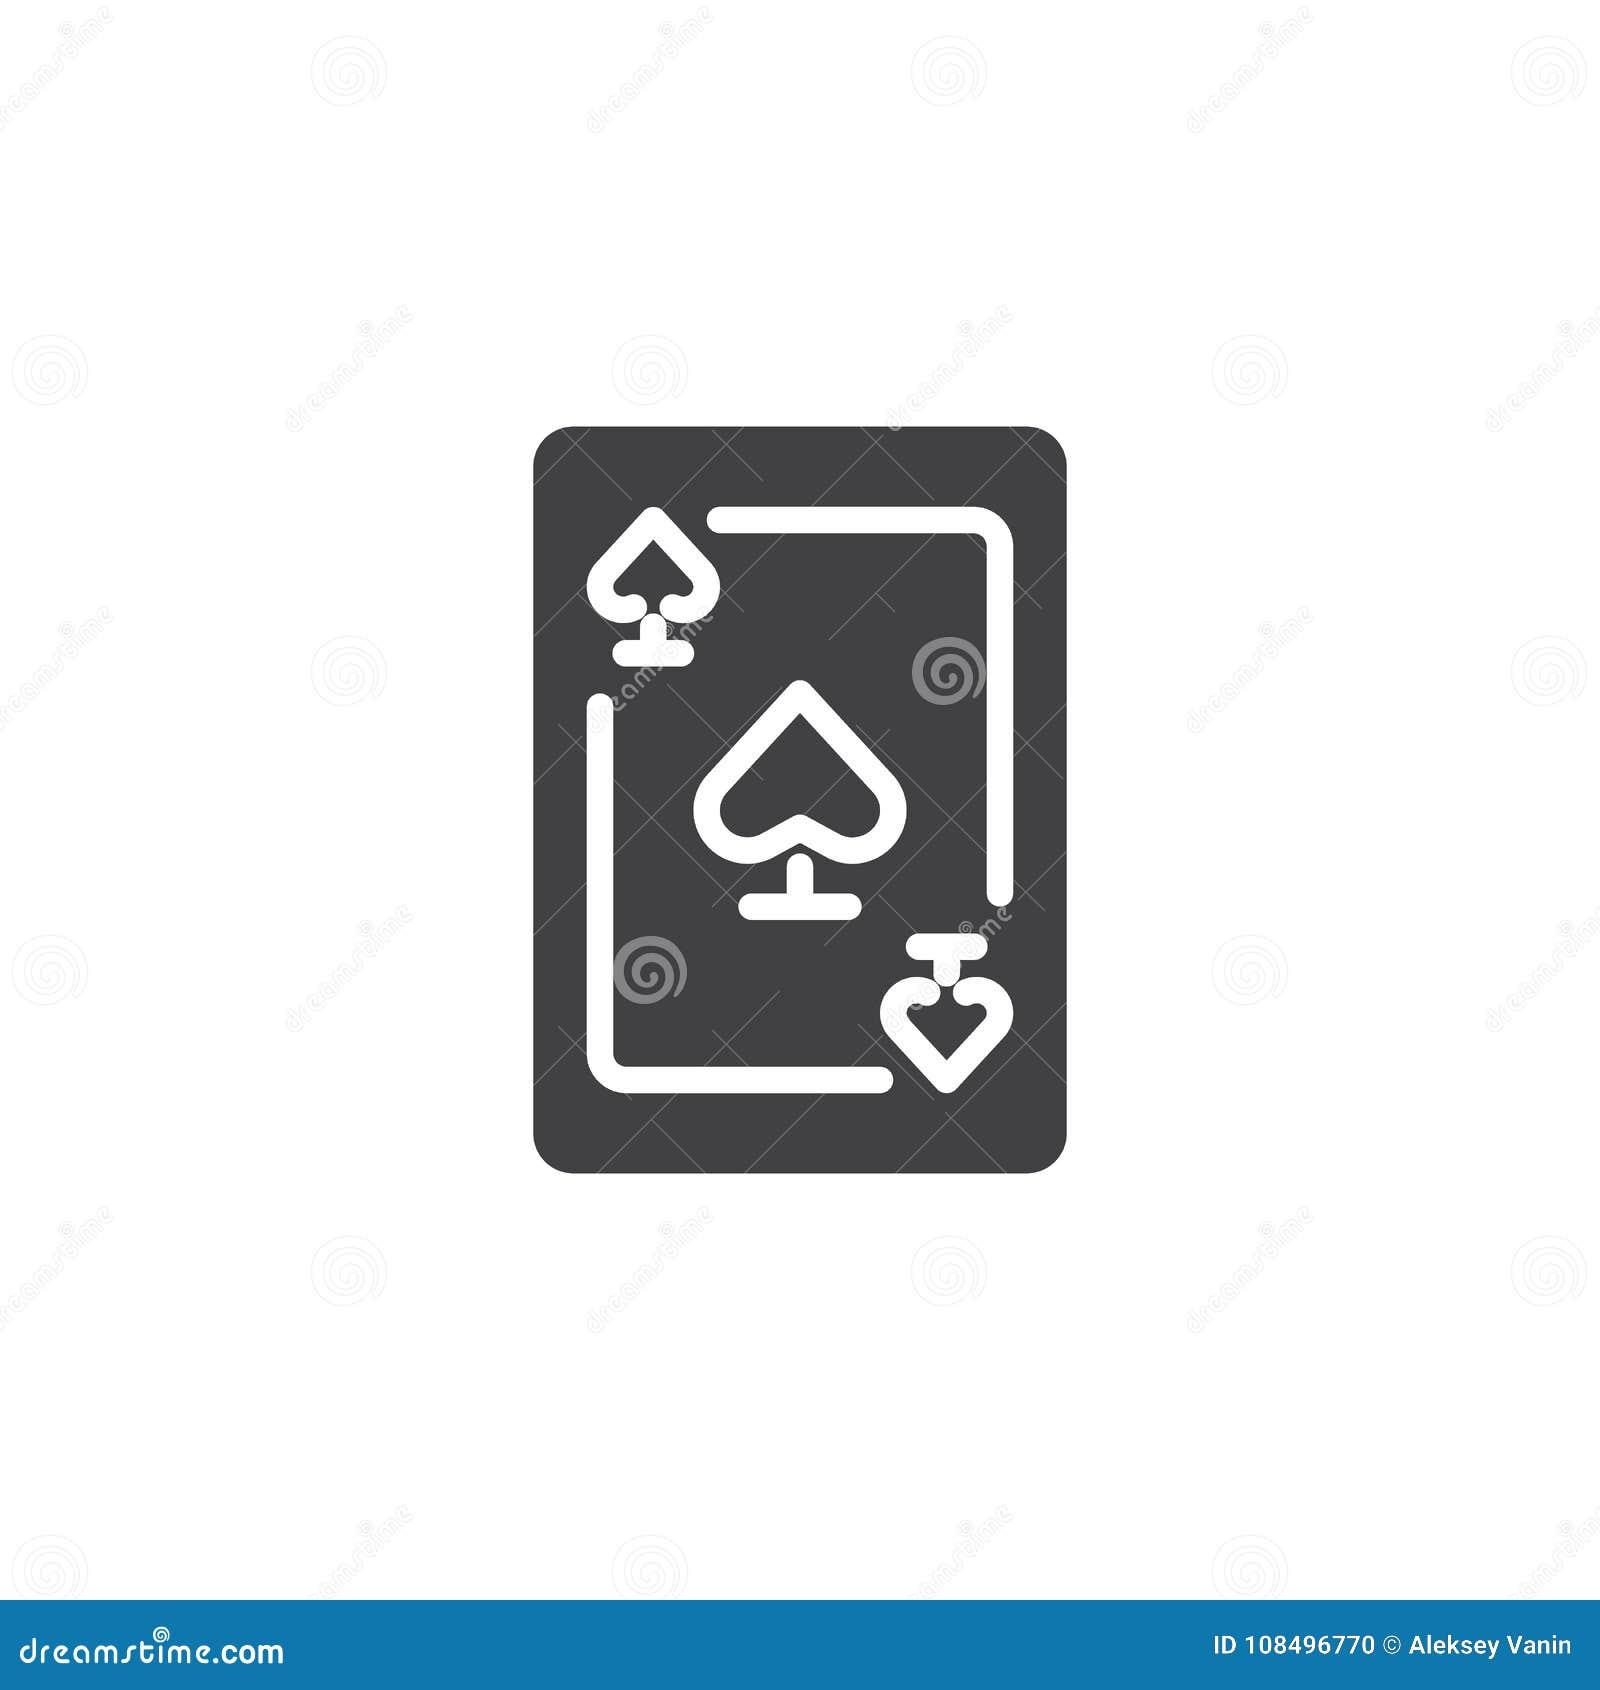 Ace of spades icon vector stock vector illustration of luck 108496770 ace of spades icon vector biocorpaavc Choice Image